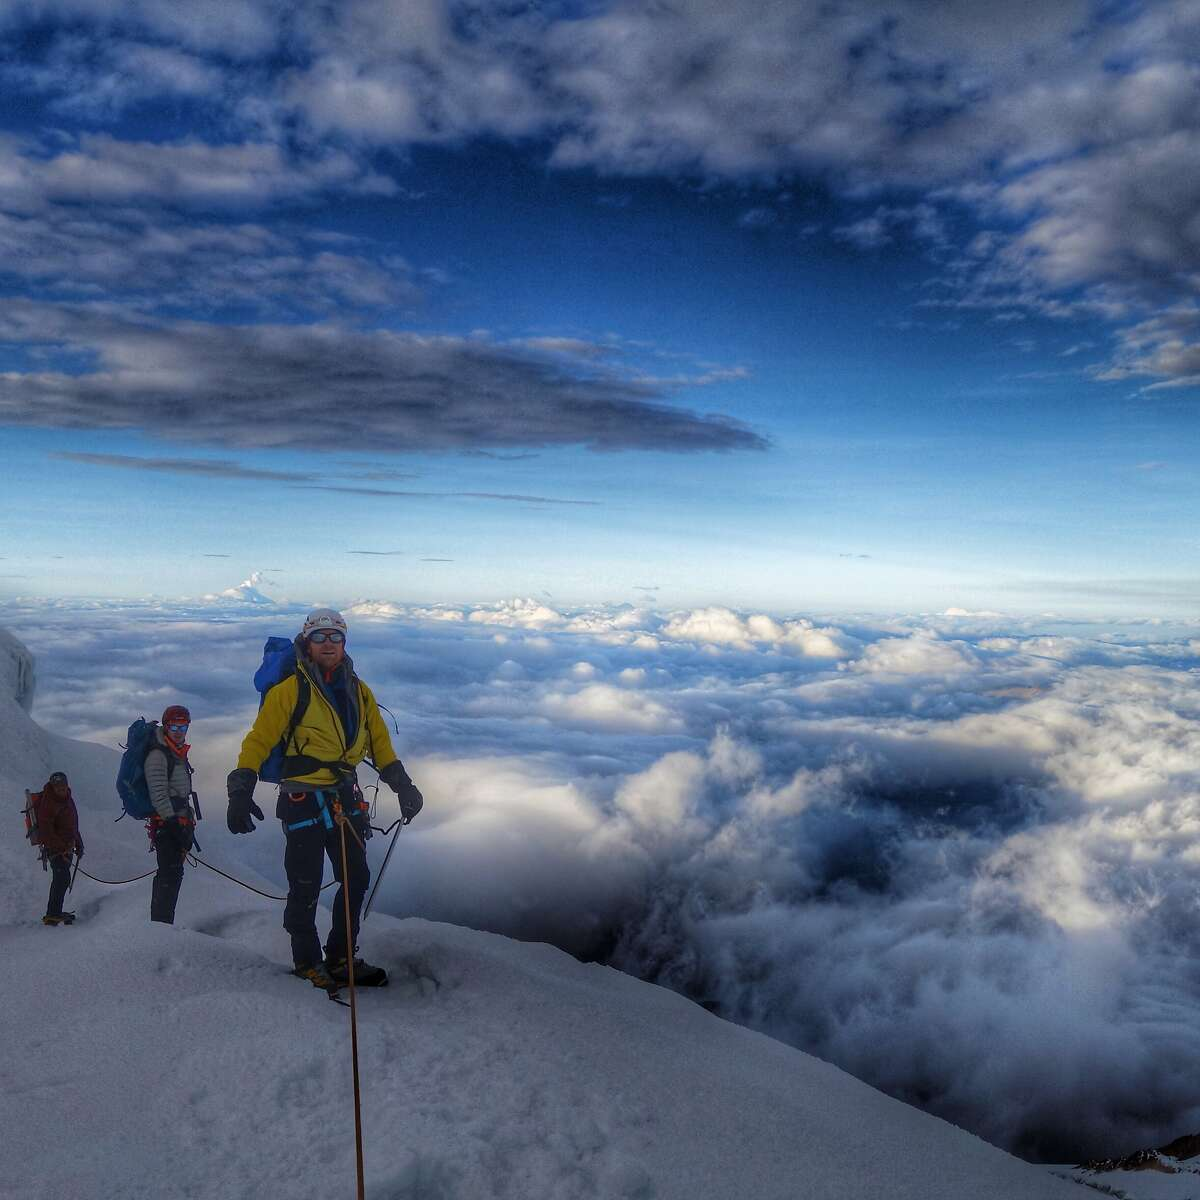 Graham Cooper, of Oakland, climbing in Ecuador in 2015.